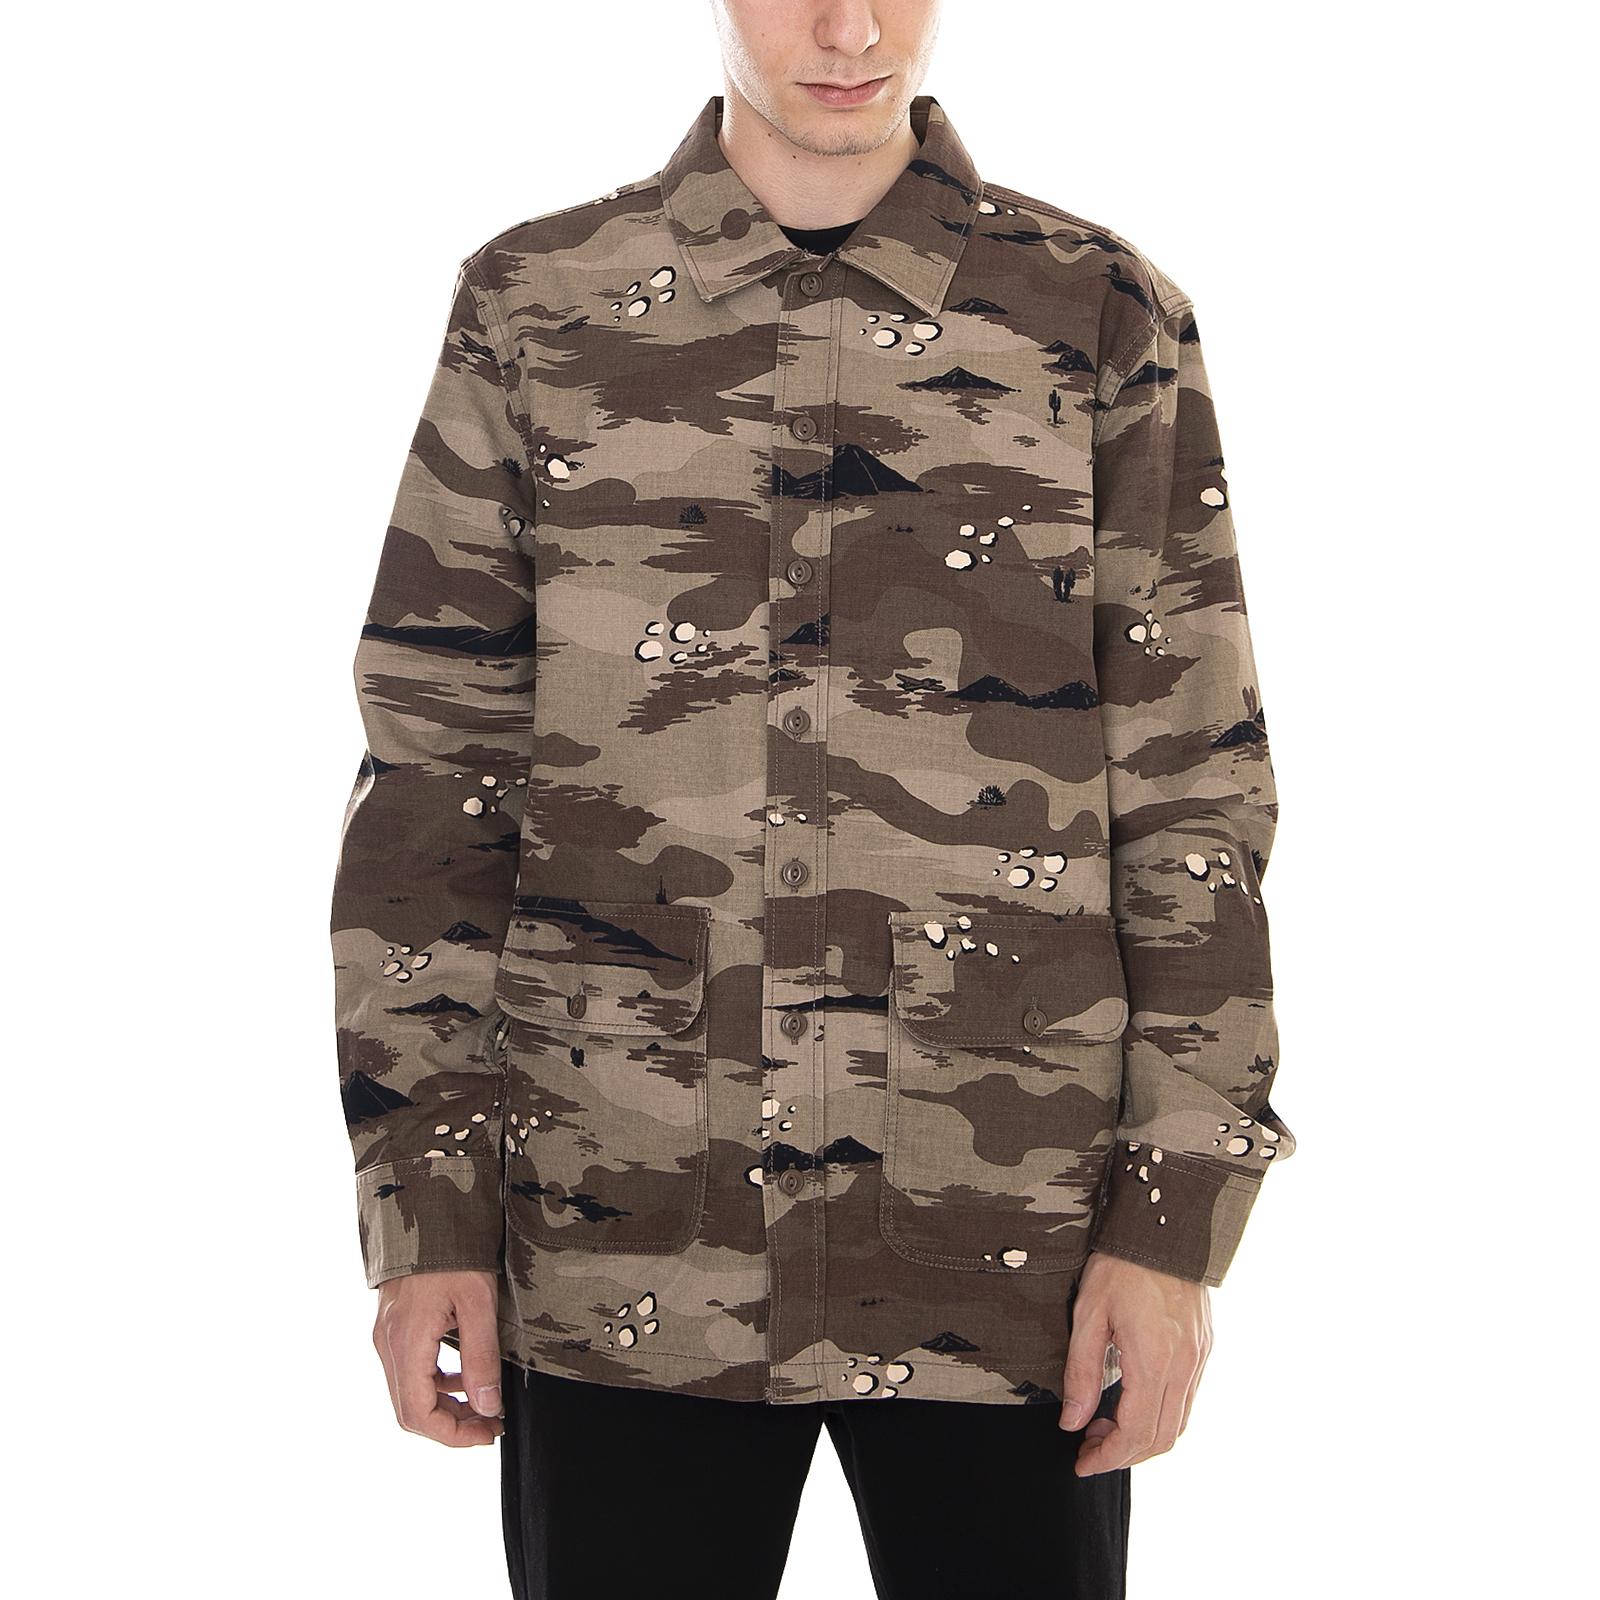 Vans Sweatshirt Mn Mn Mn Winchester Storm Camo Camo a94c16